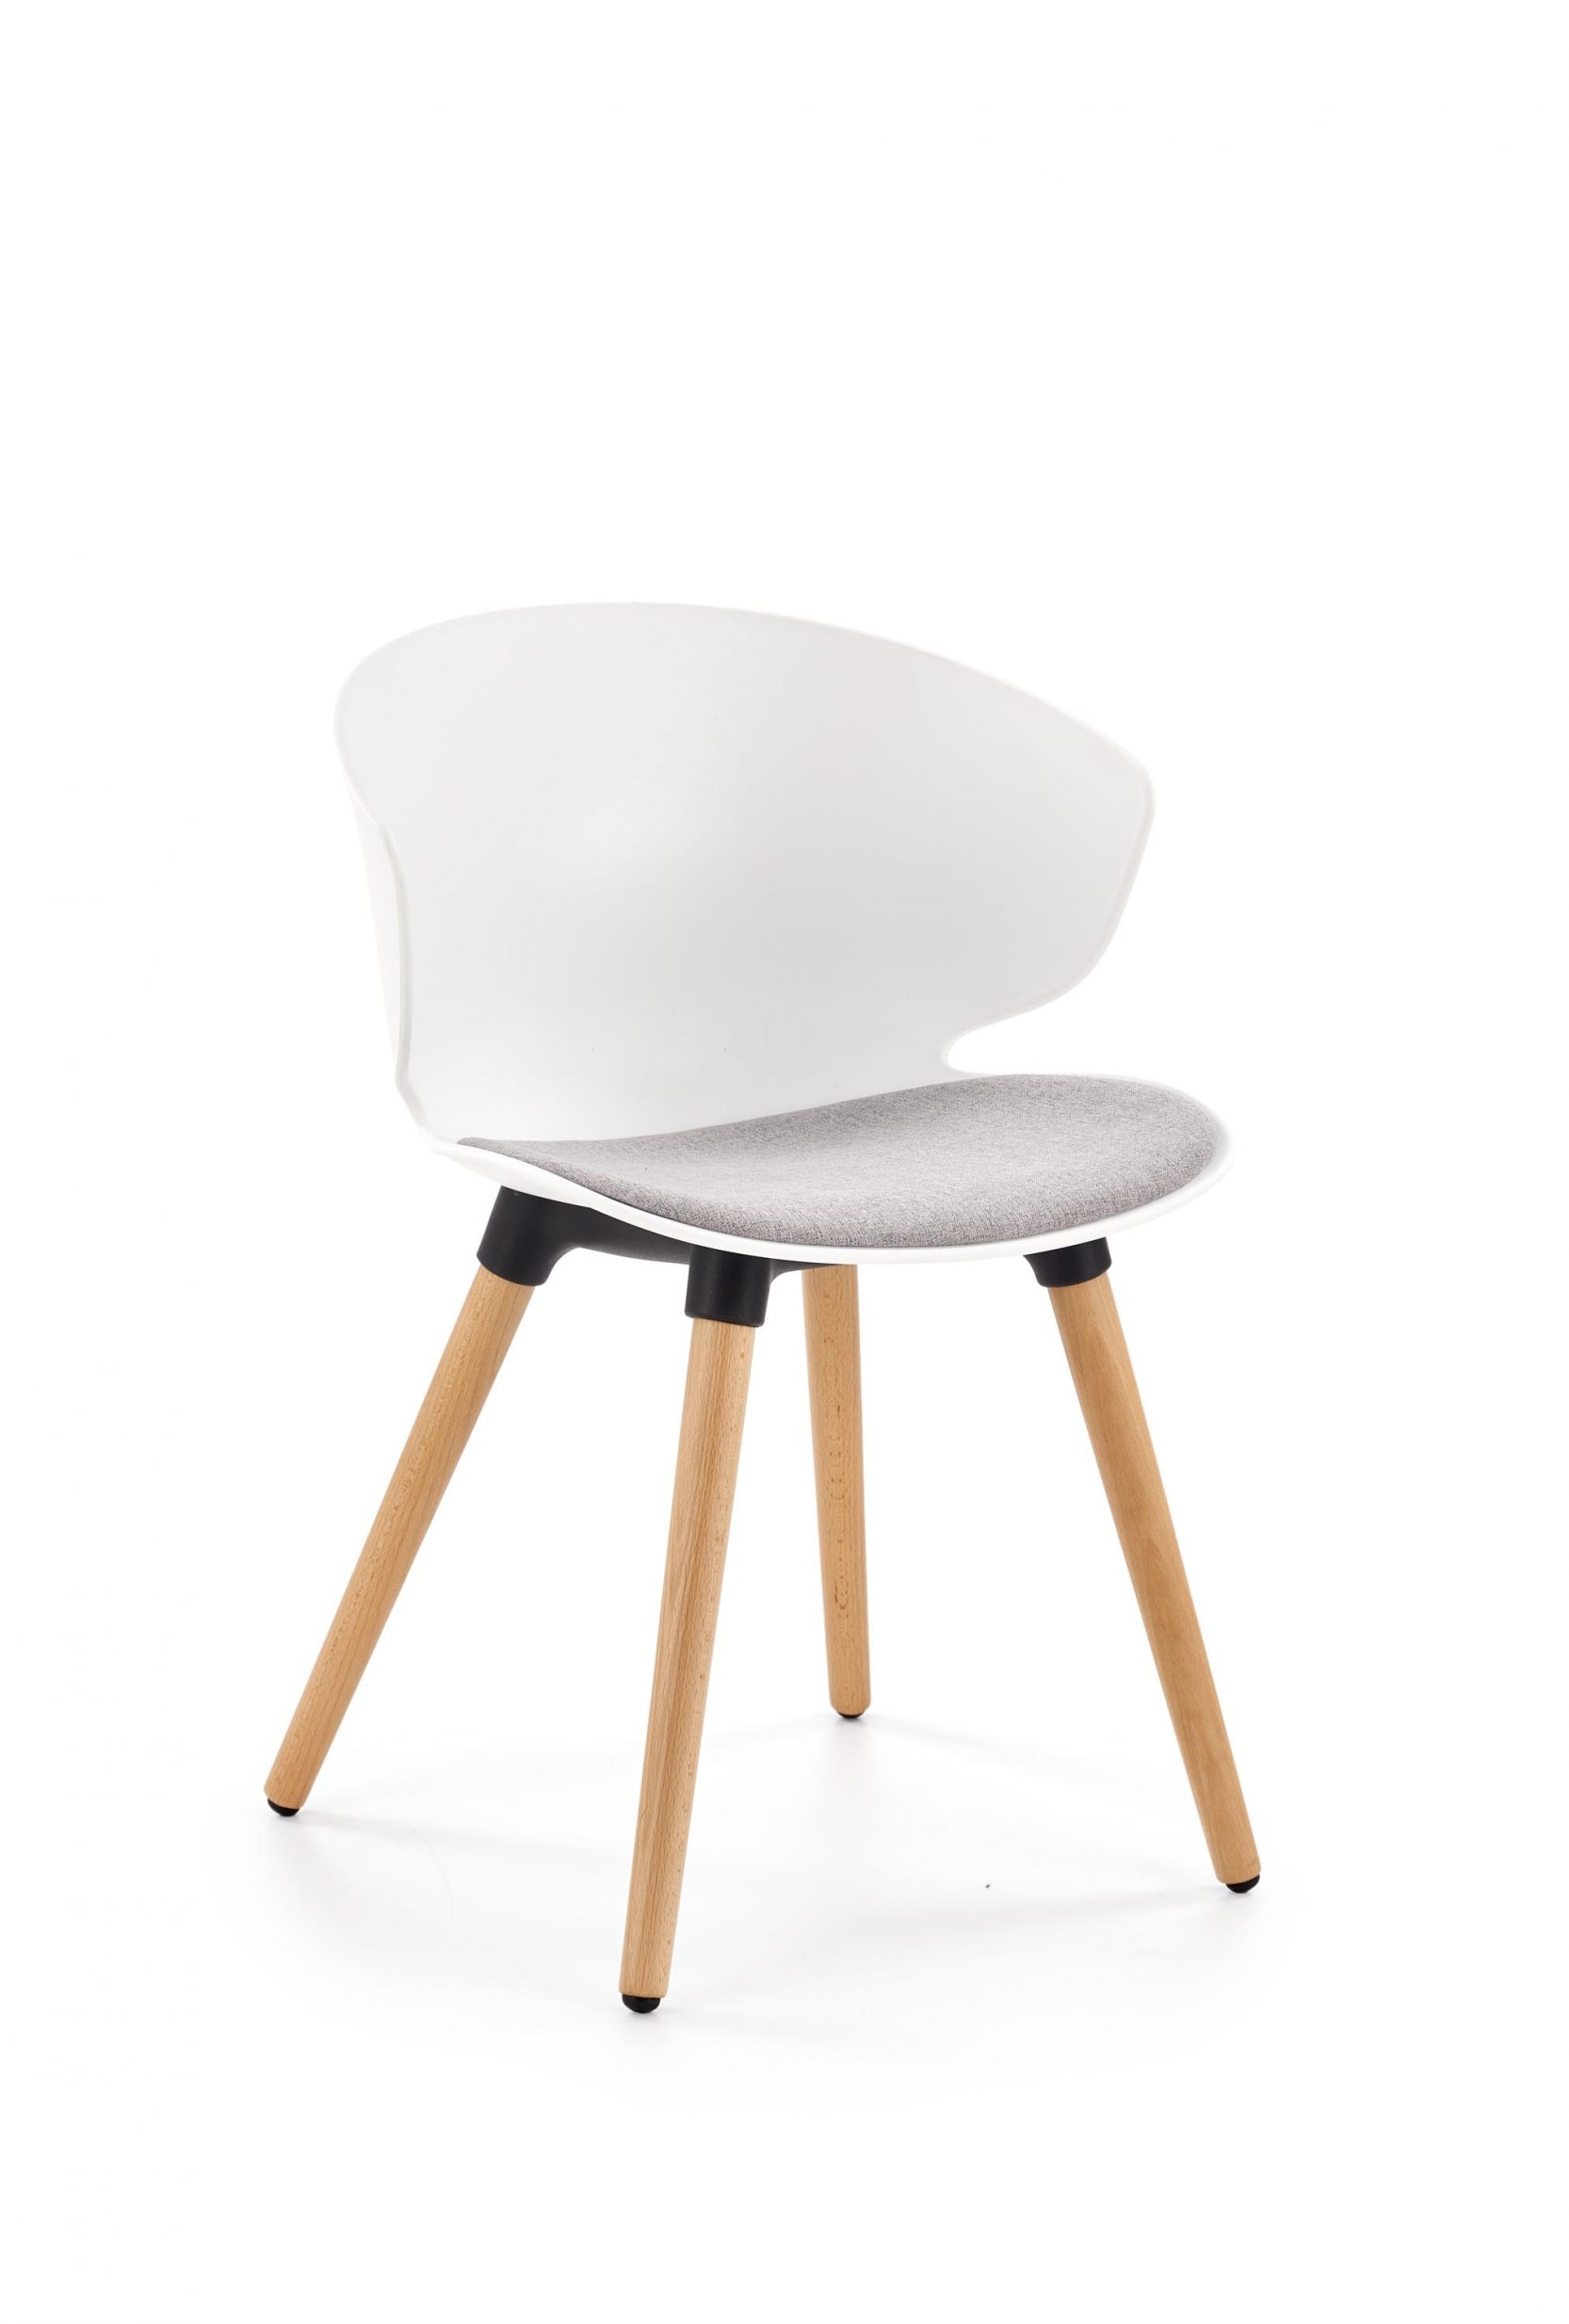 Scaun din plastic, cu sezut tapitat cu stofa si picioare din lemn K324 Alb / Gri / Natural, l55xA52xH75 cm